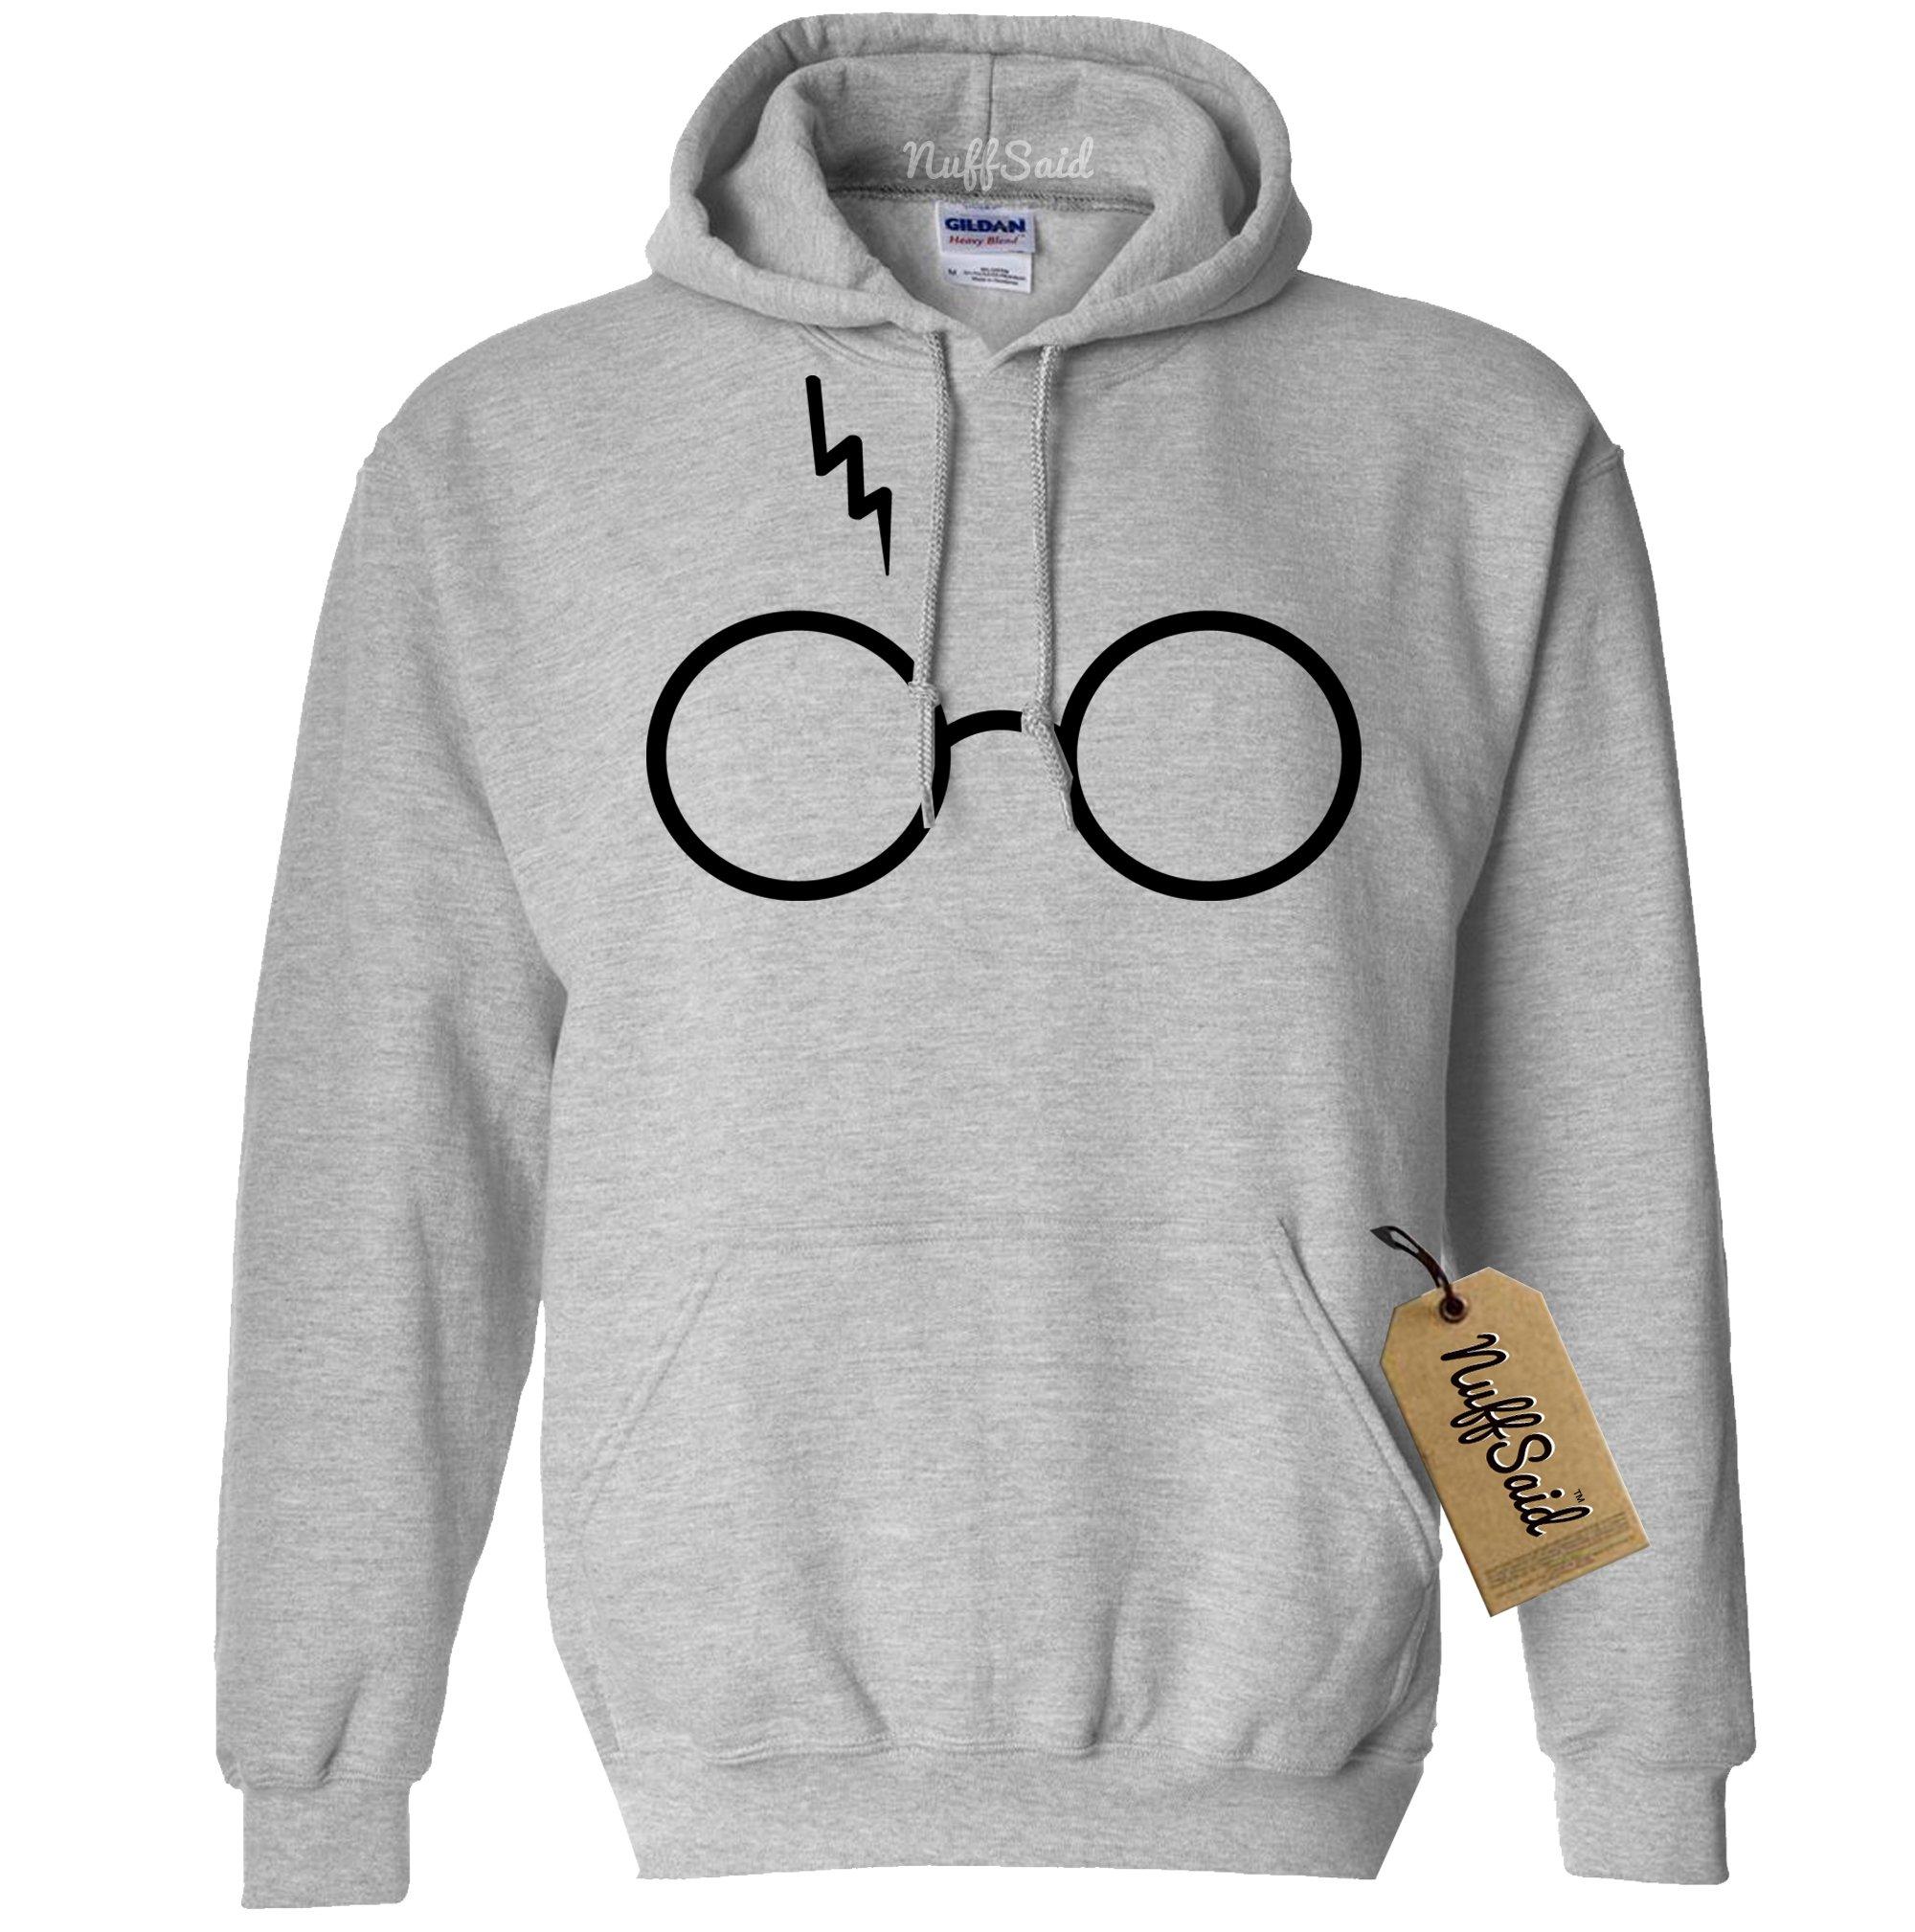 Glasses w/Lighting Scar Inspired by Harry Potter Hoodie Sweatshirt- Unisex Fit (Large, Grey w/Black Ink)